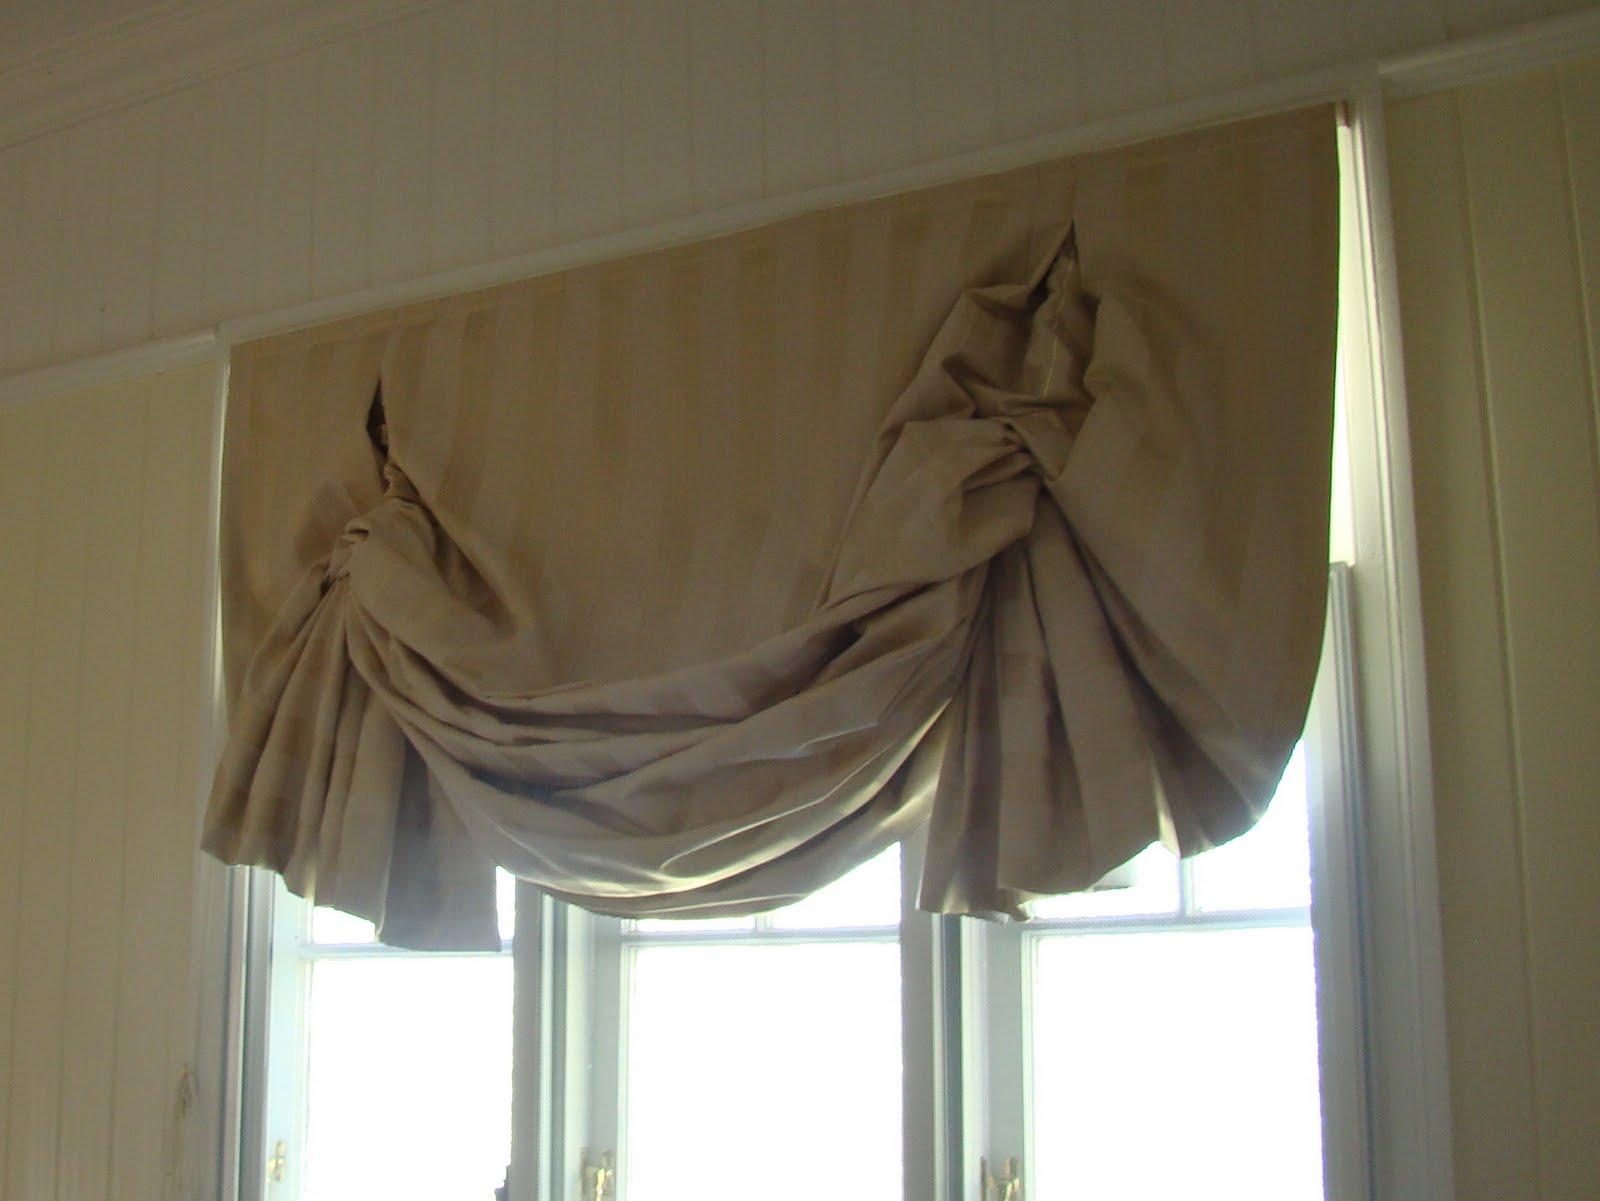 Bedroom Nesting London Blinds Cook Clean Craft